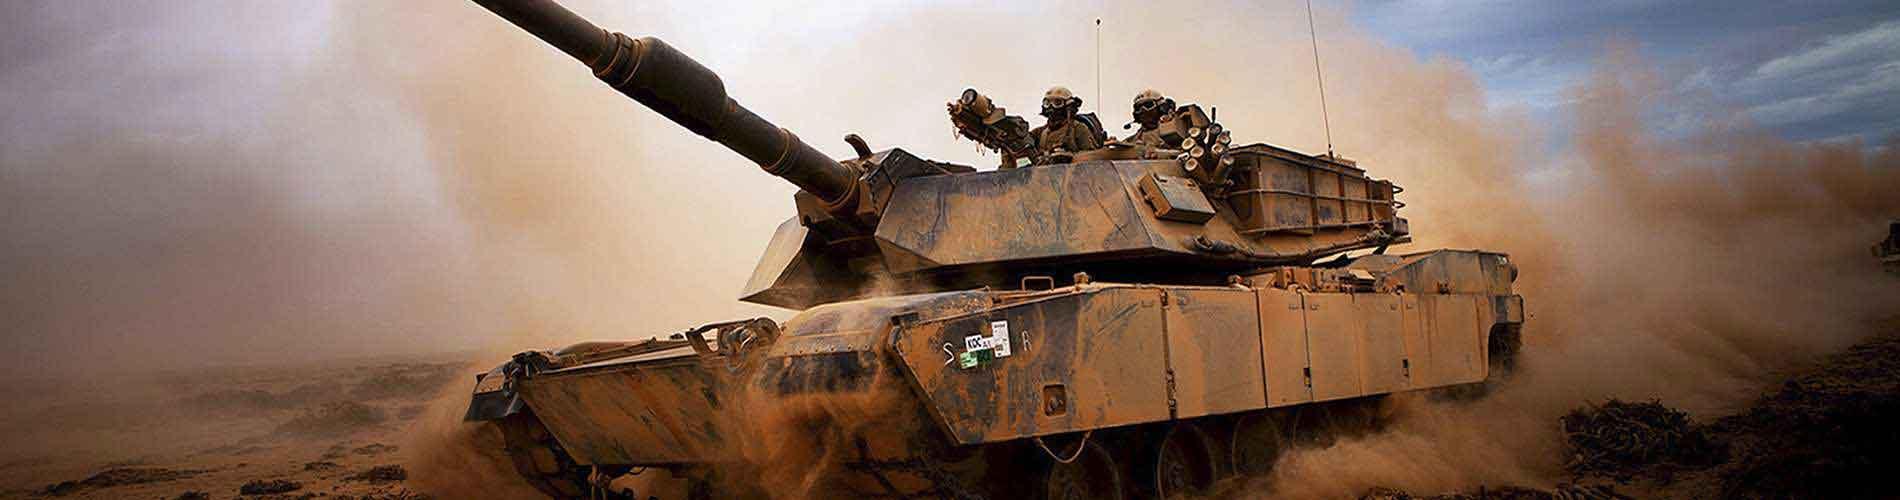 Armored tank.